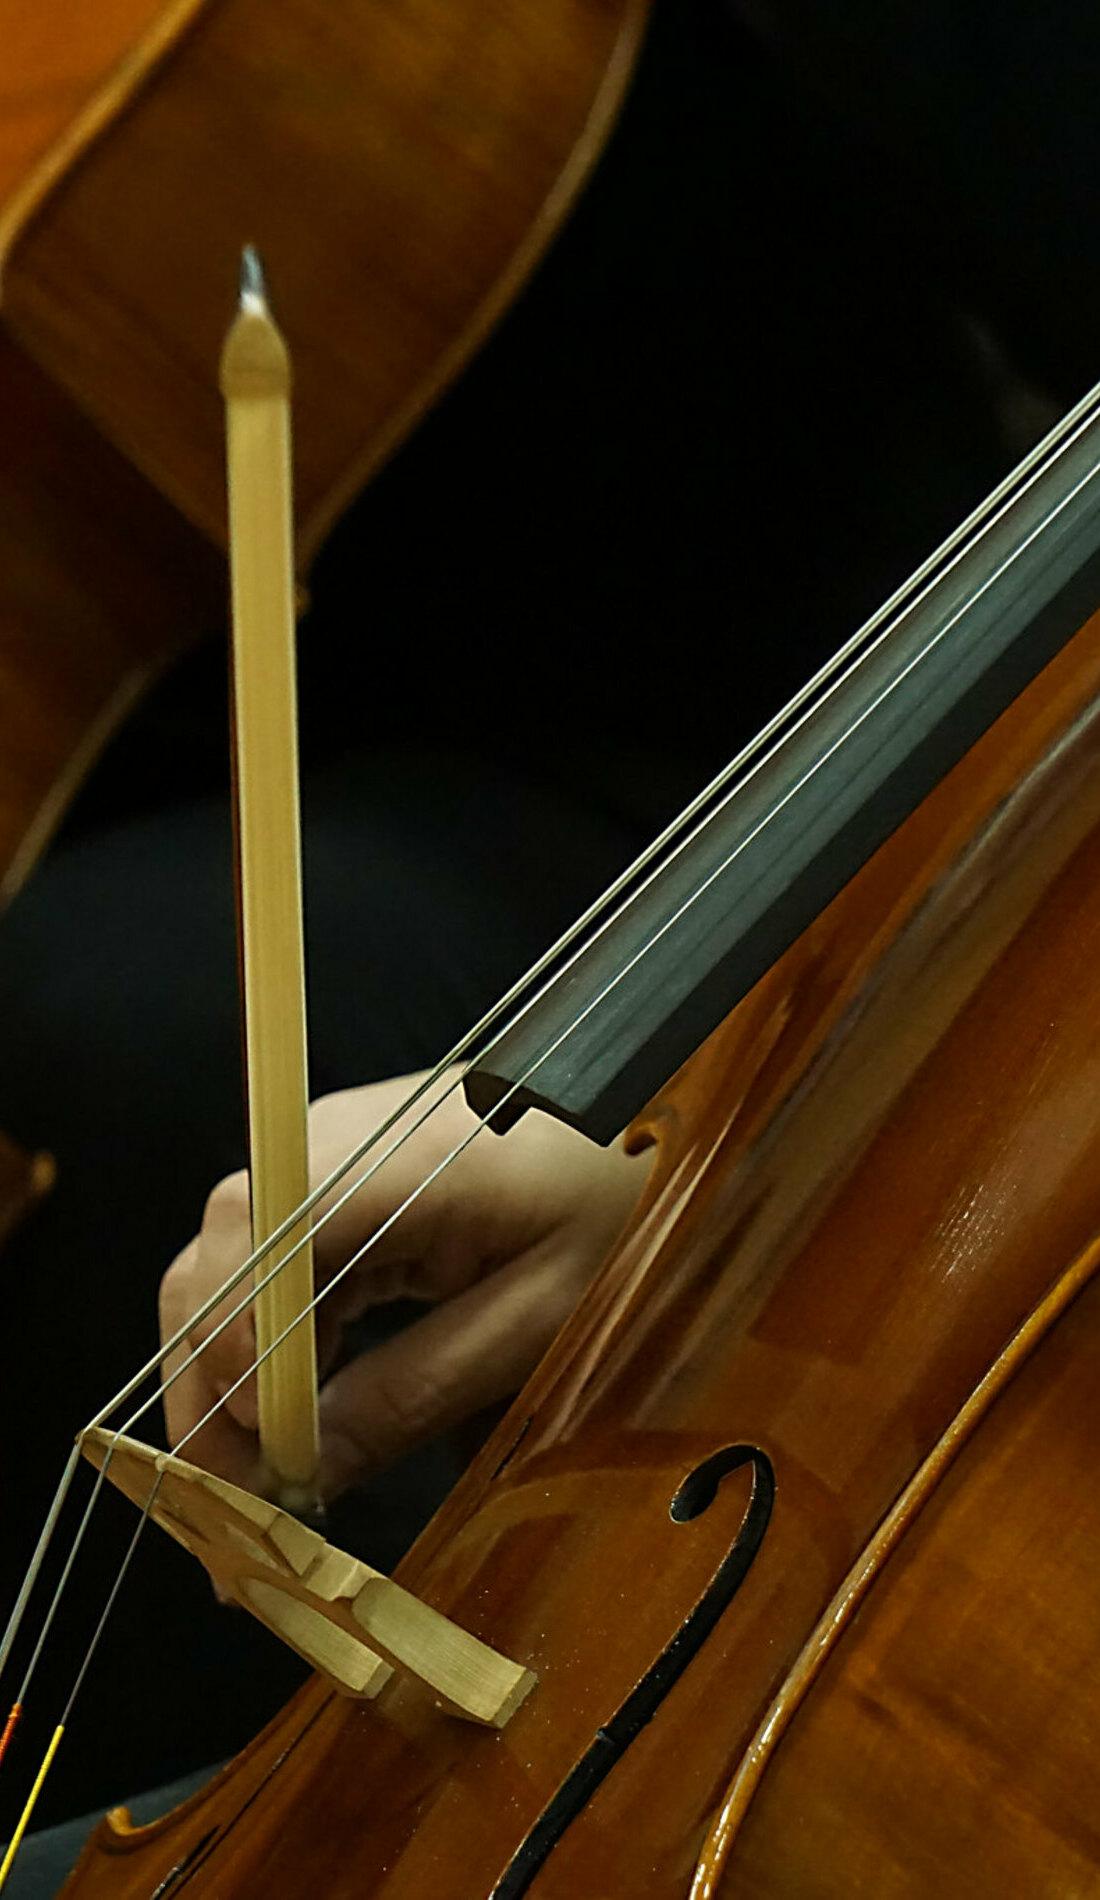 A New World Symphony live event